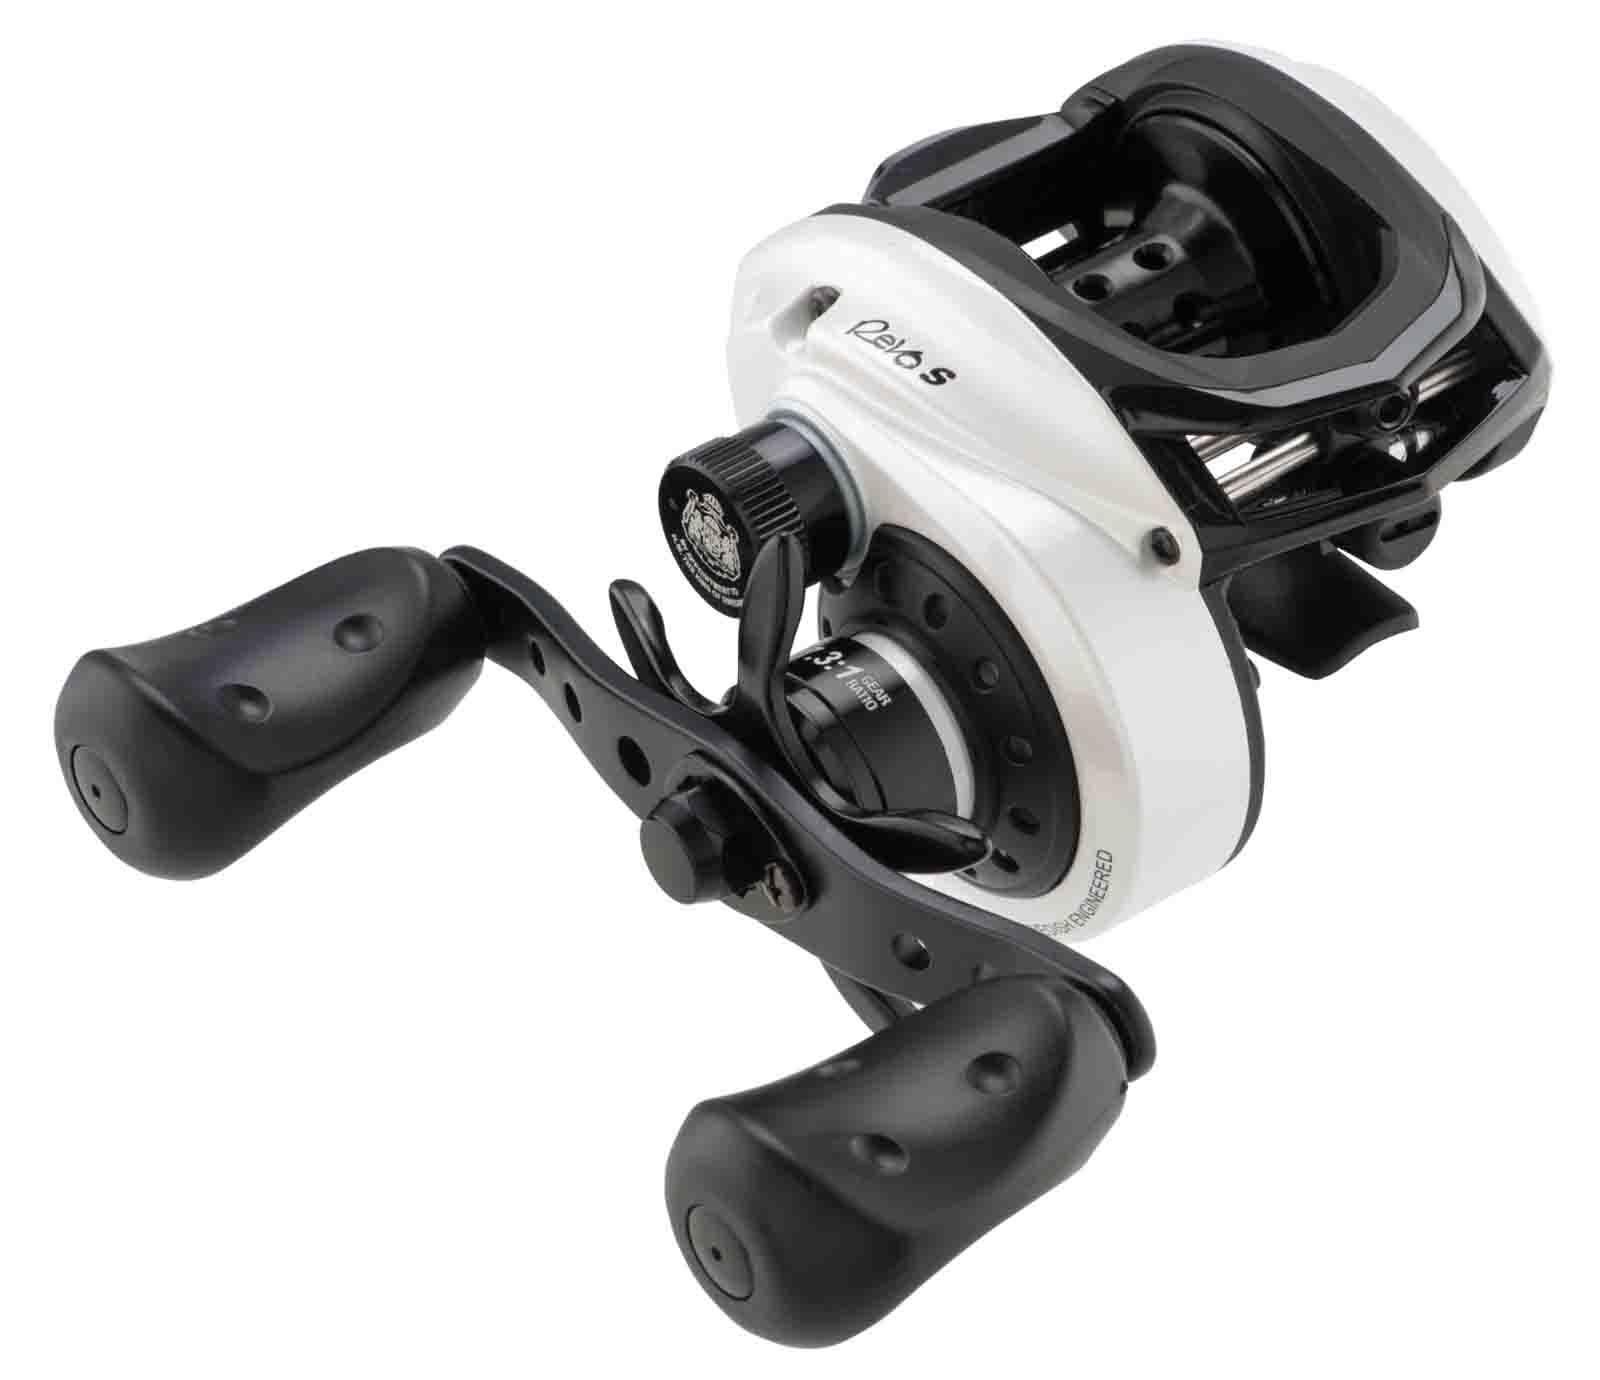 Abu Garcia Revo 4S Low Profile Bait Caster Fishing Reel - All Sizes